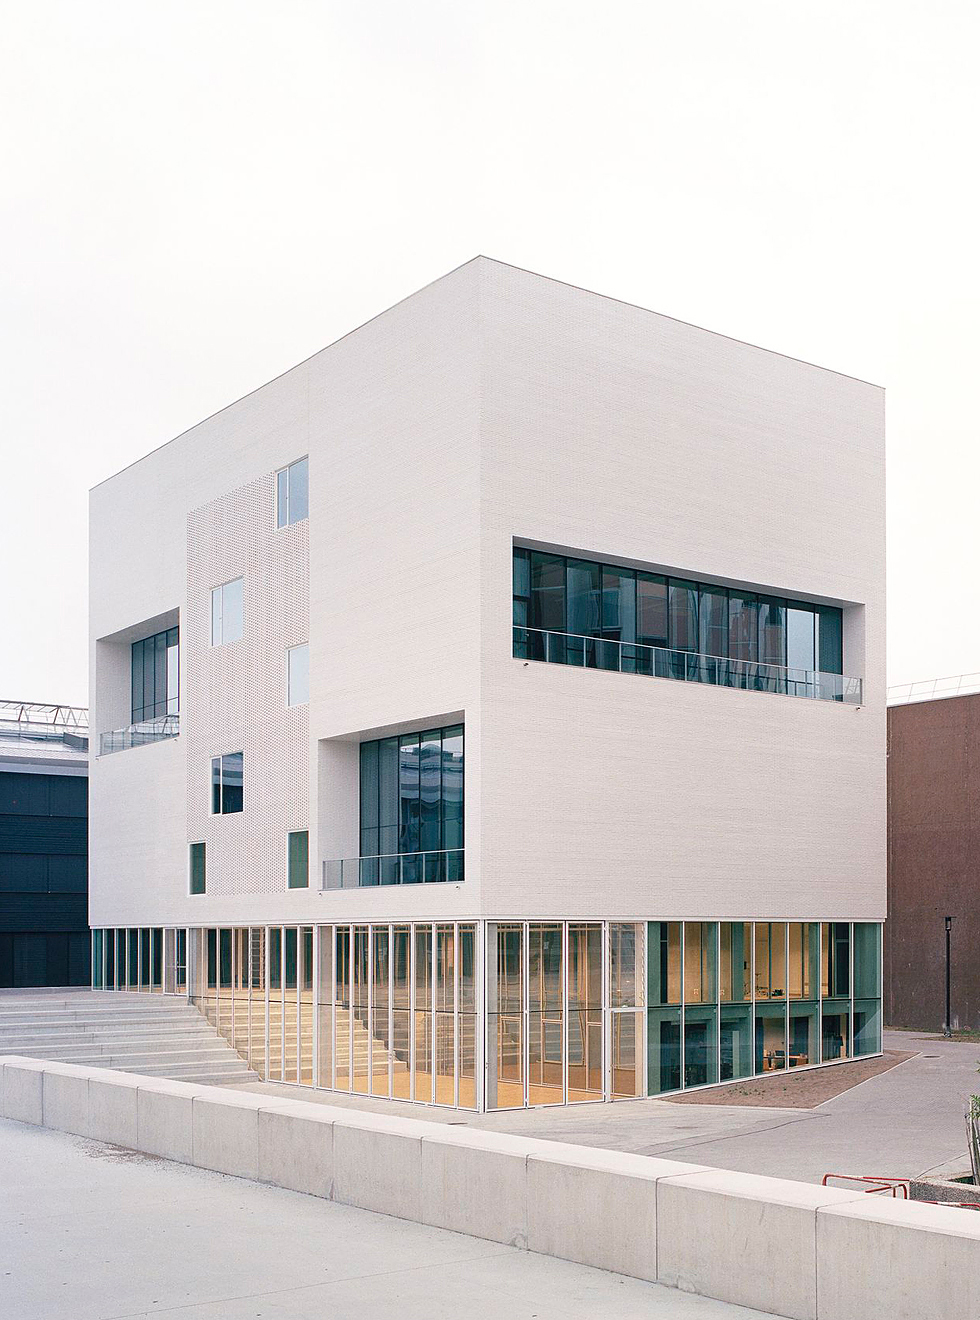 atelier raum nantes frankreich freiburger architekturforum. Black Bedroom Furniture Sets. Home Design Ideas